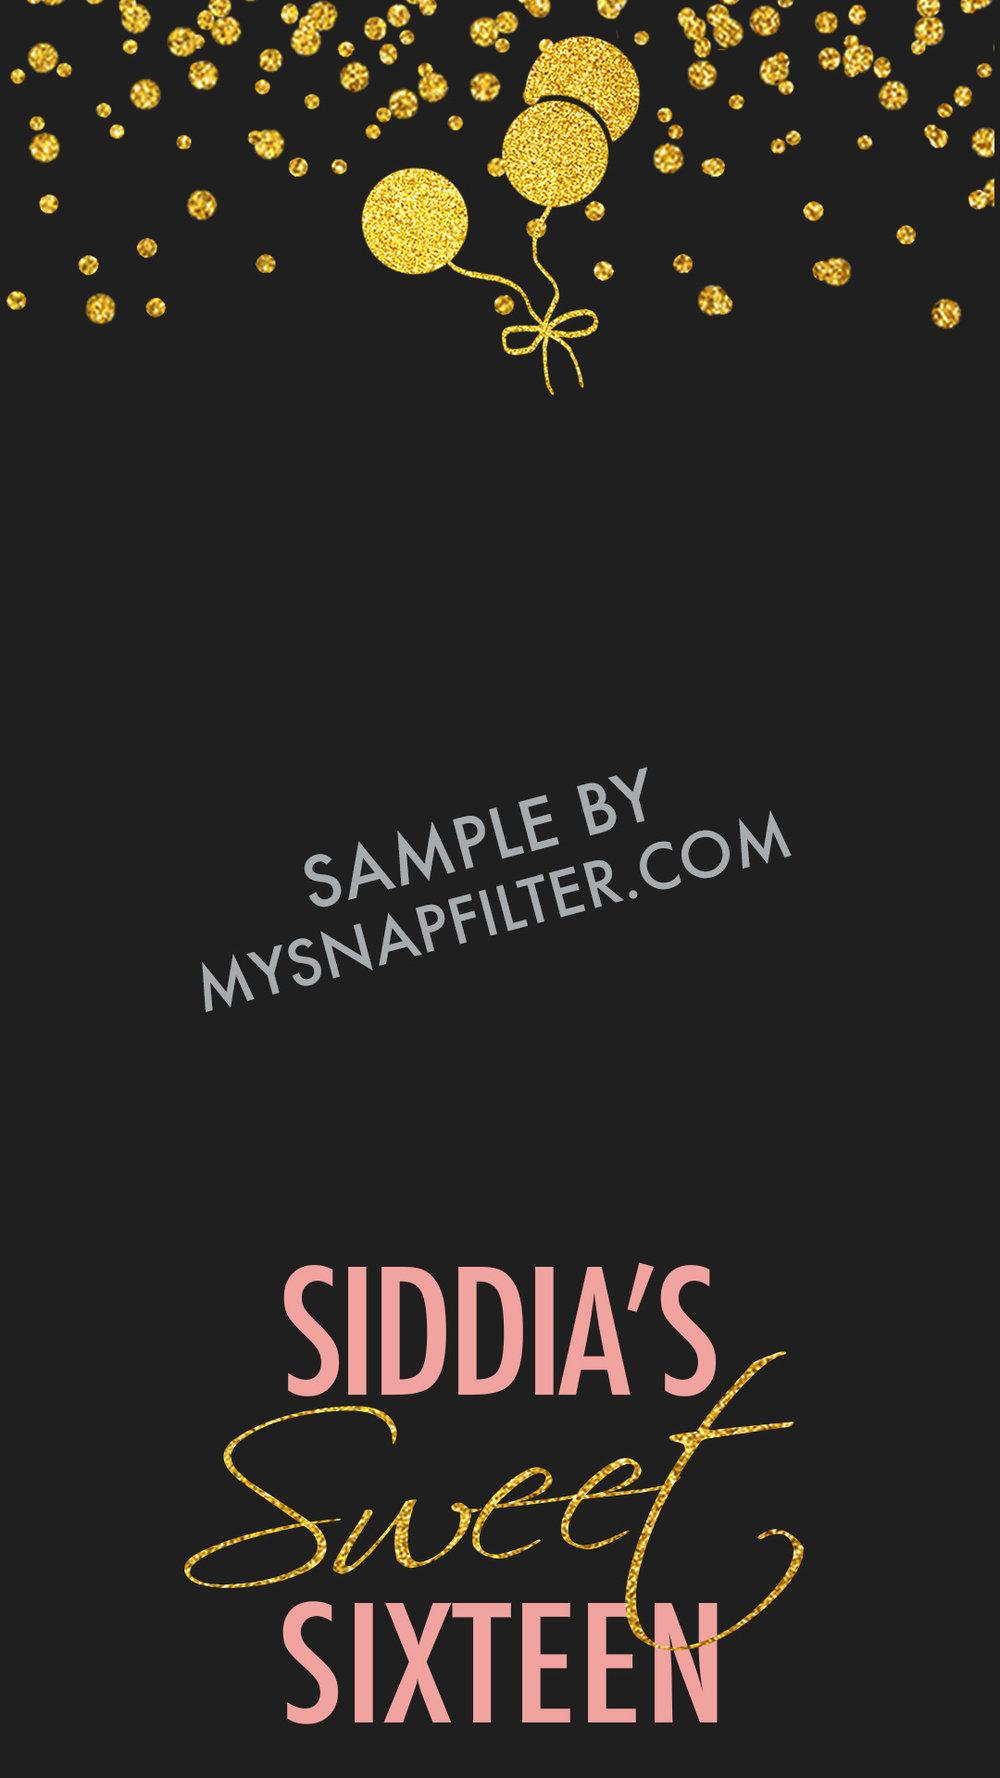 Siddias Sweet 16_.jpg